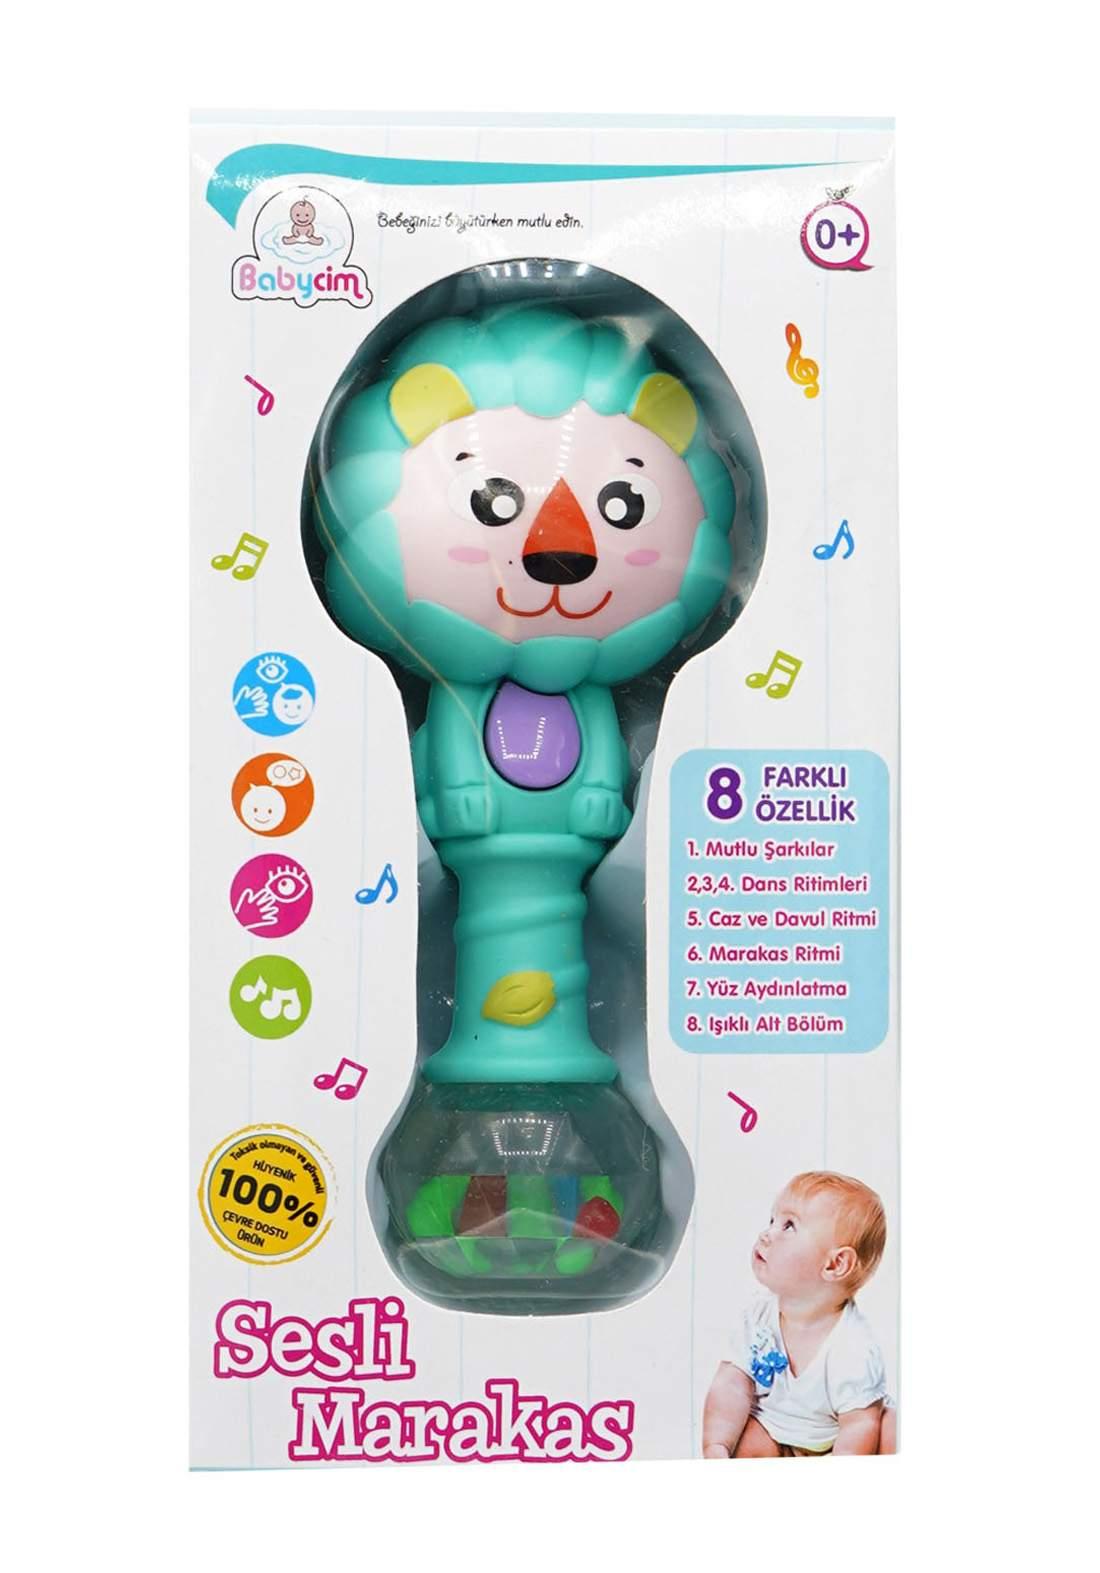 Babycim Battery Lighted Musical Maracas Lion - Green  لعبة أطفال موسيقية